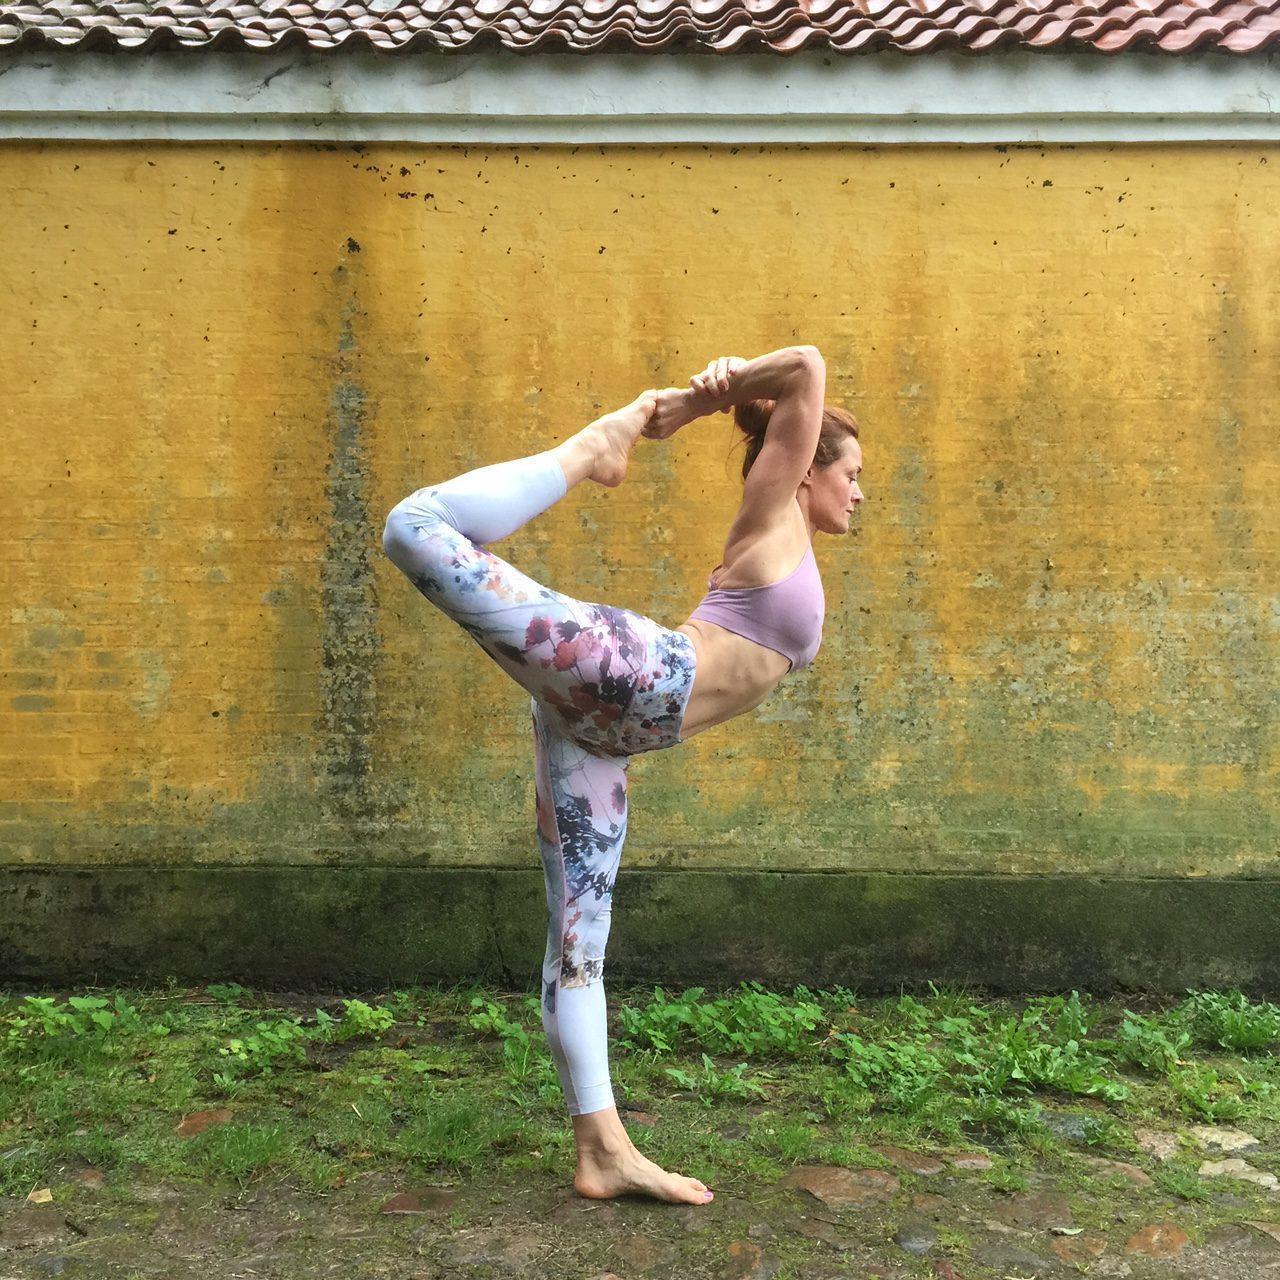 yoga, yogapose, run and relax, run & relax, signe yoga, signe schineller, yoga med signe, yoga rosendal, yoga rosendal signe, yogaklær, yogatights, yogaeverydamnday, yoga pose, asana, yoga holbæk